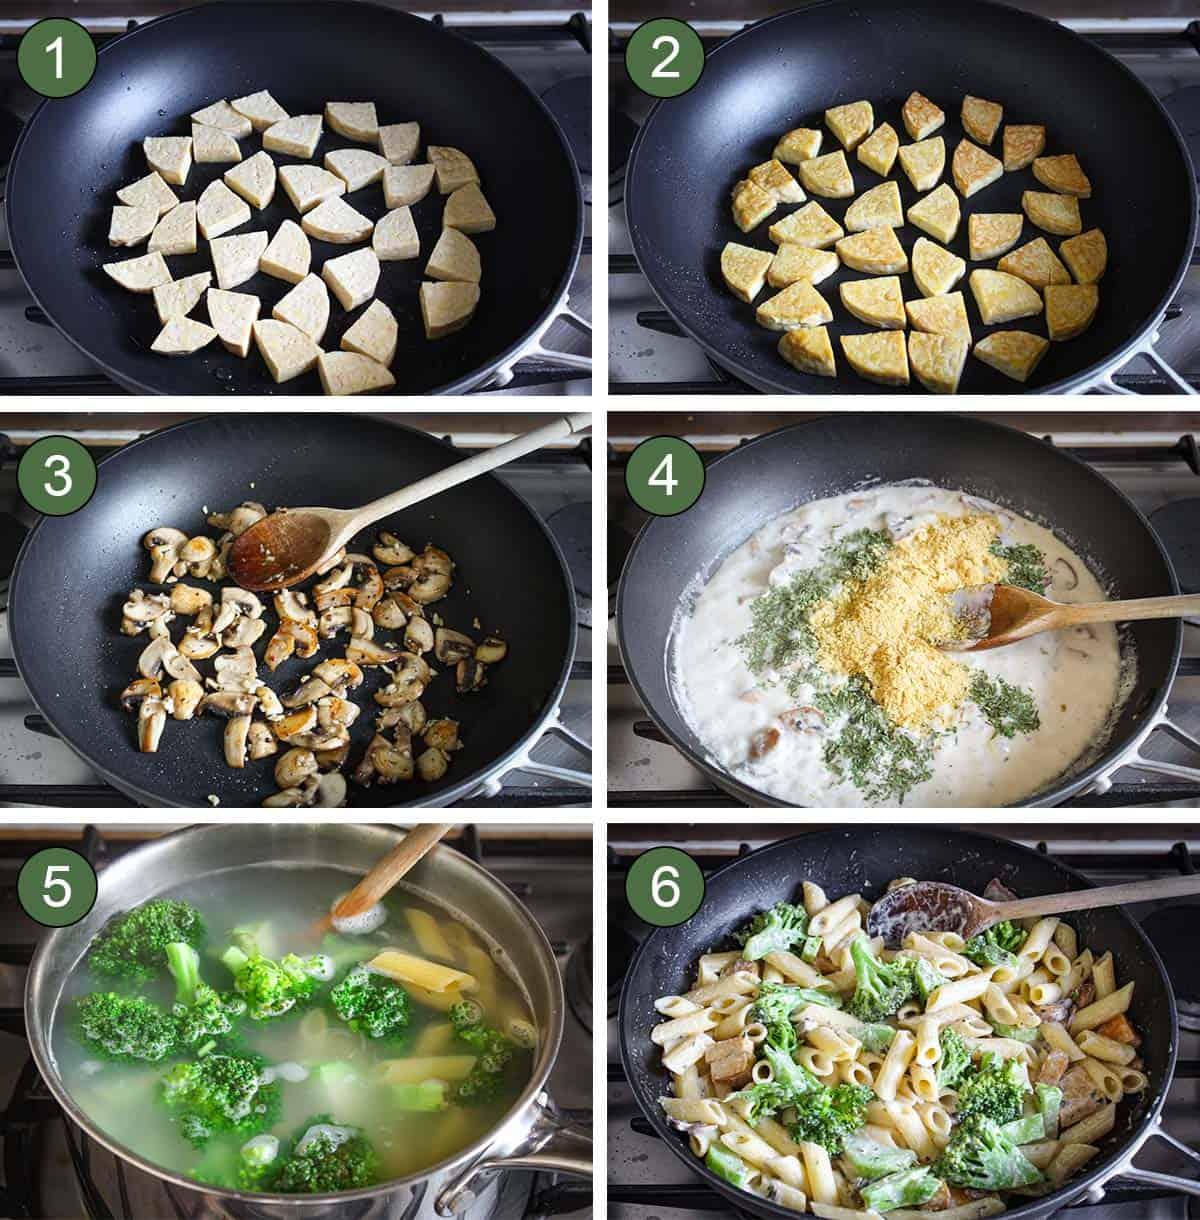 6 Process Shots Showing How to Make Creamy Vegan Pasta